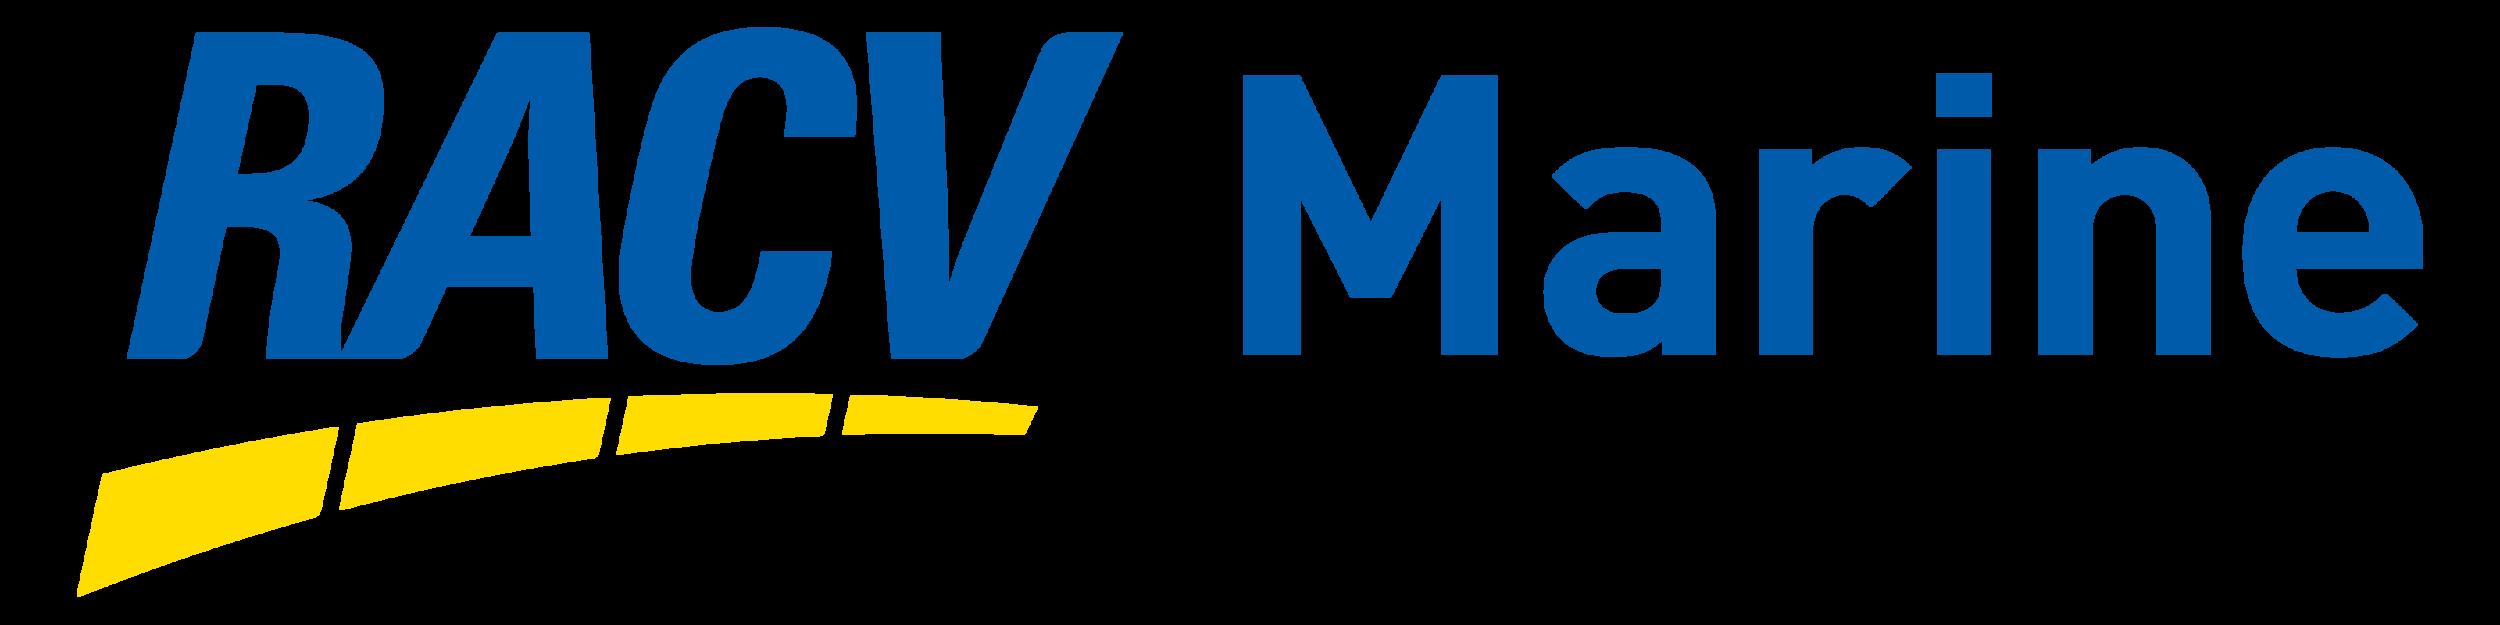 RACV Marine logo col v2.png